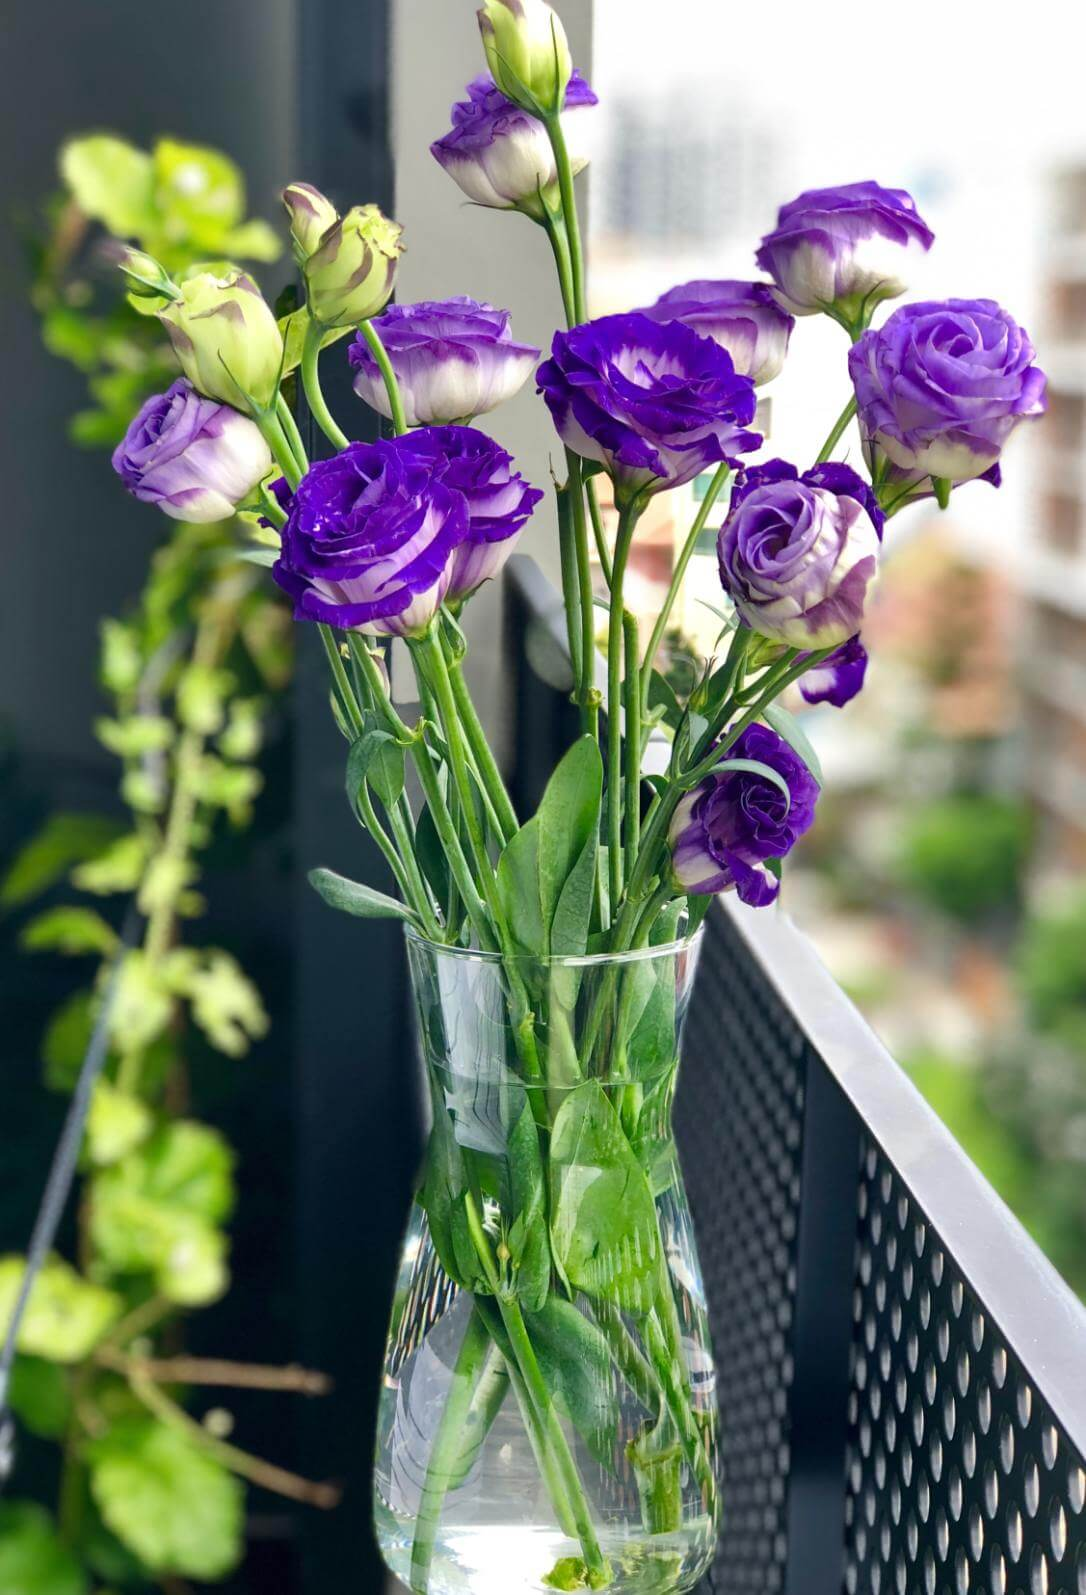 Purple Flowers In a Vase - Original image